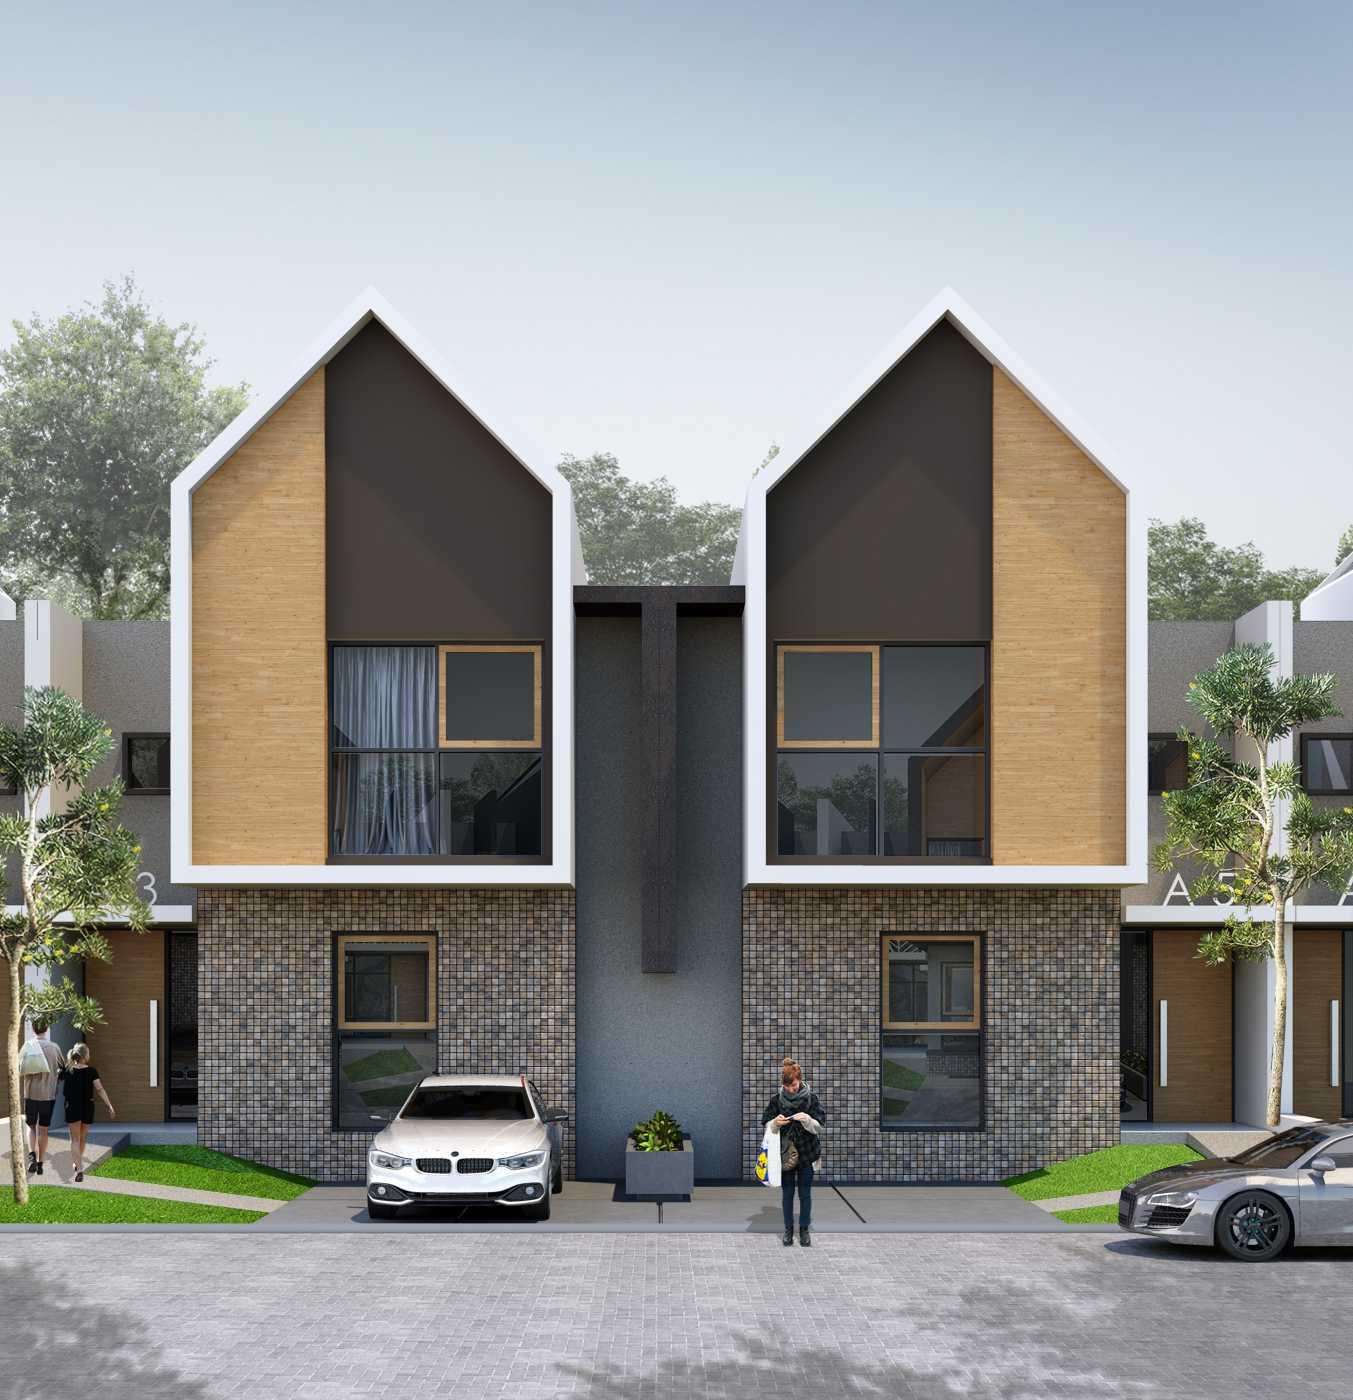 Small Space Interior Tropical Modern House Batam Batam Facade-Airlangga-Type-68 Modern,tropis,wood  13489